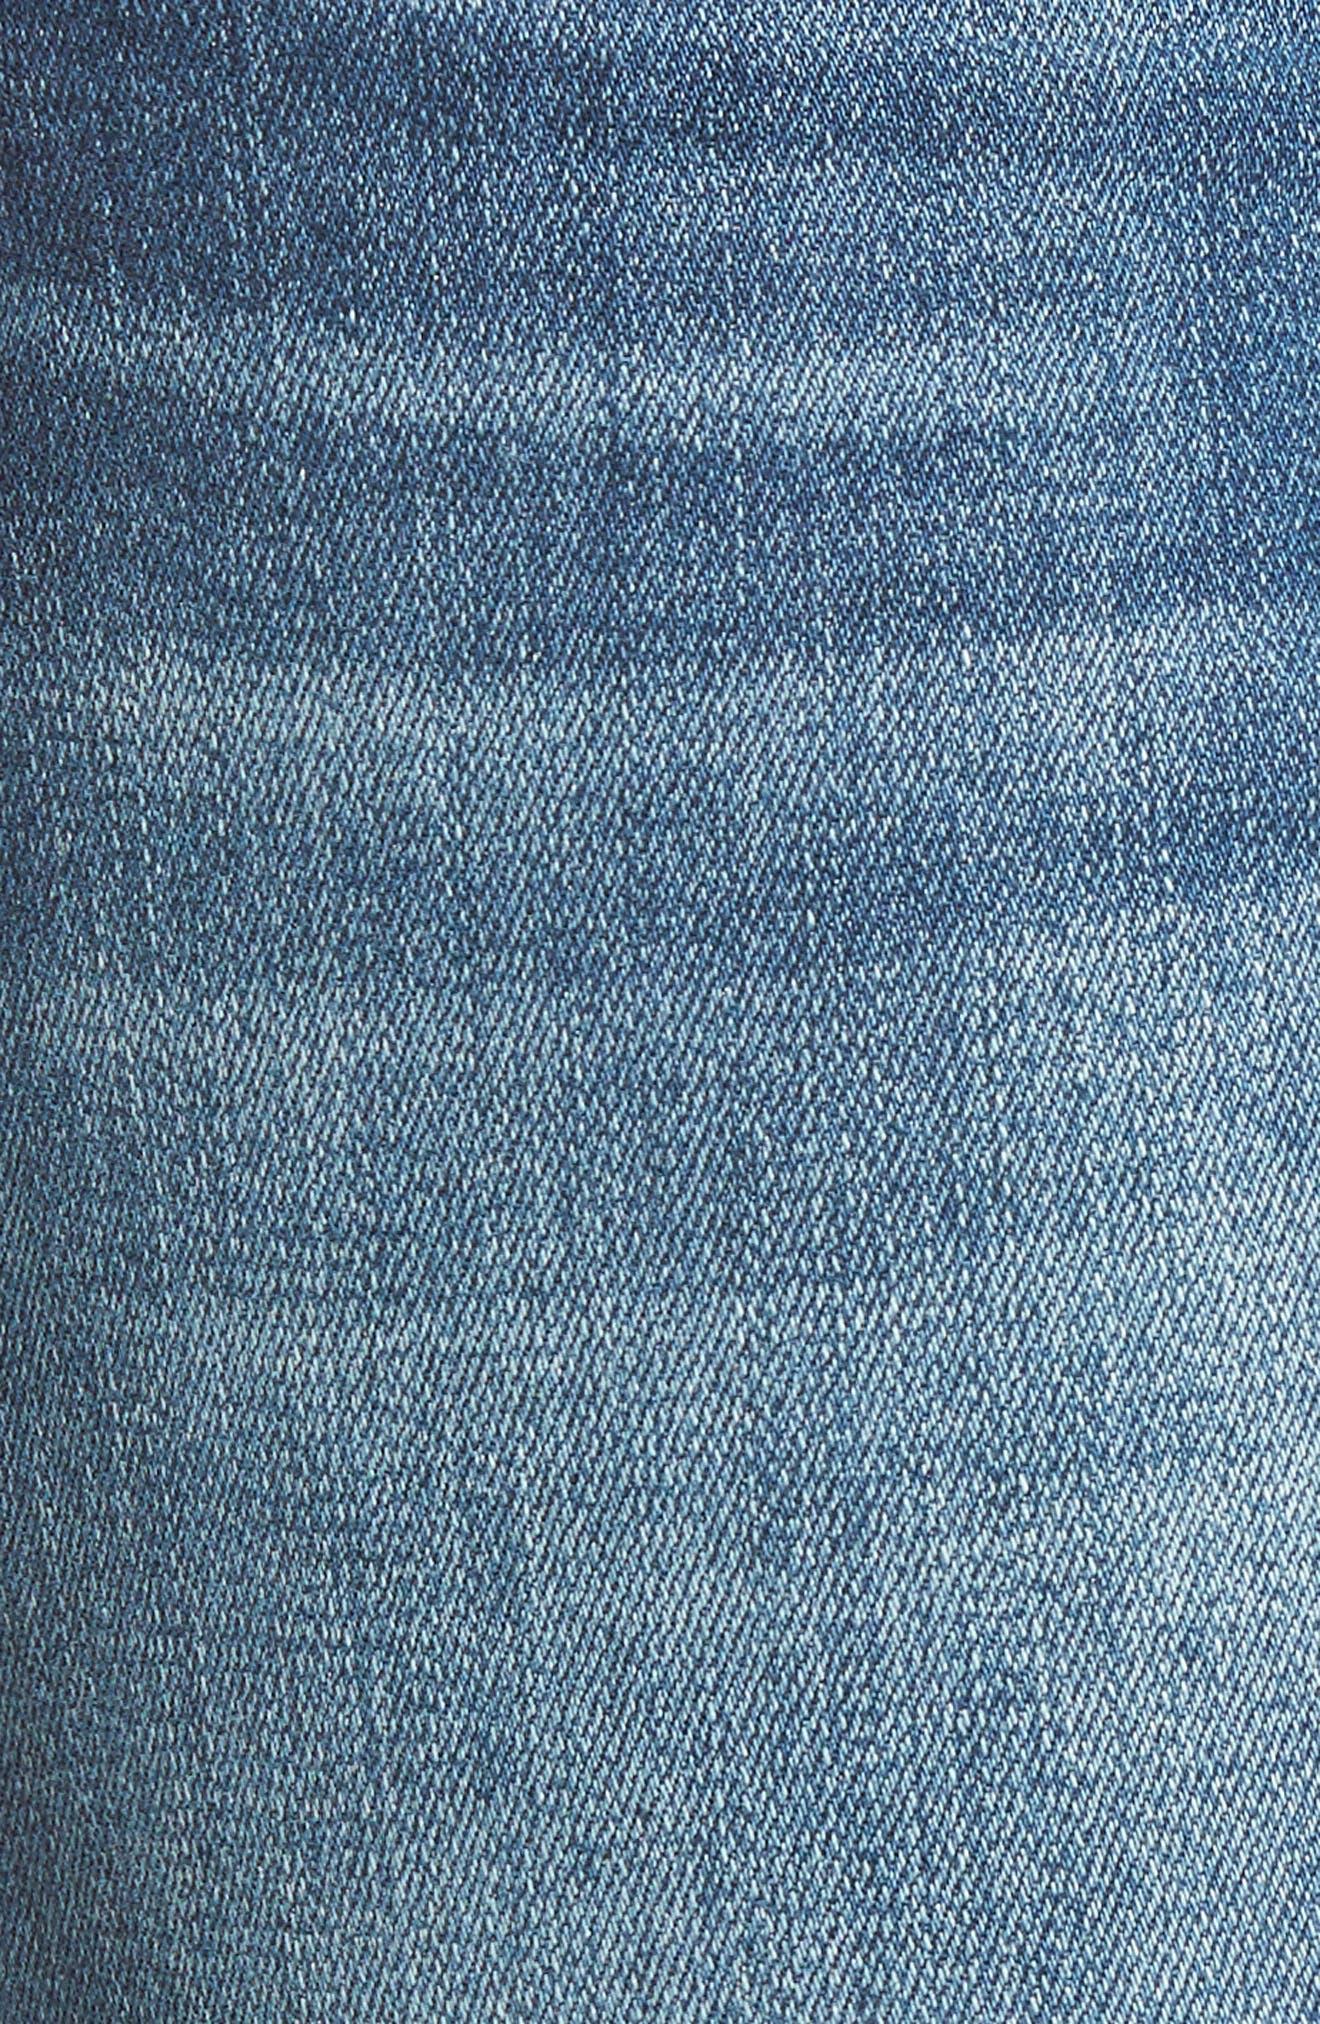 Alternate Image 5  - BP. Ripped Step Hem Skinny Jeans